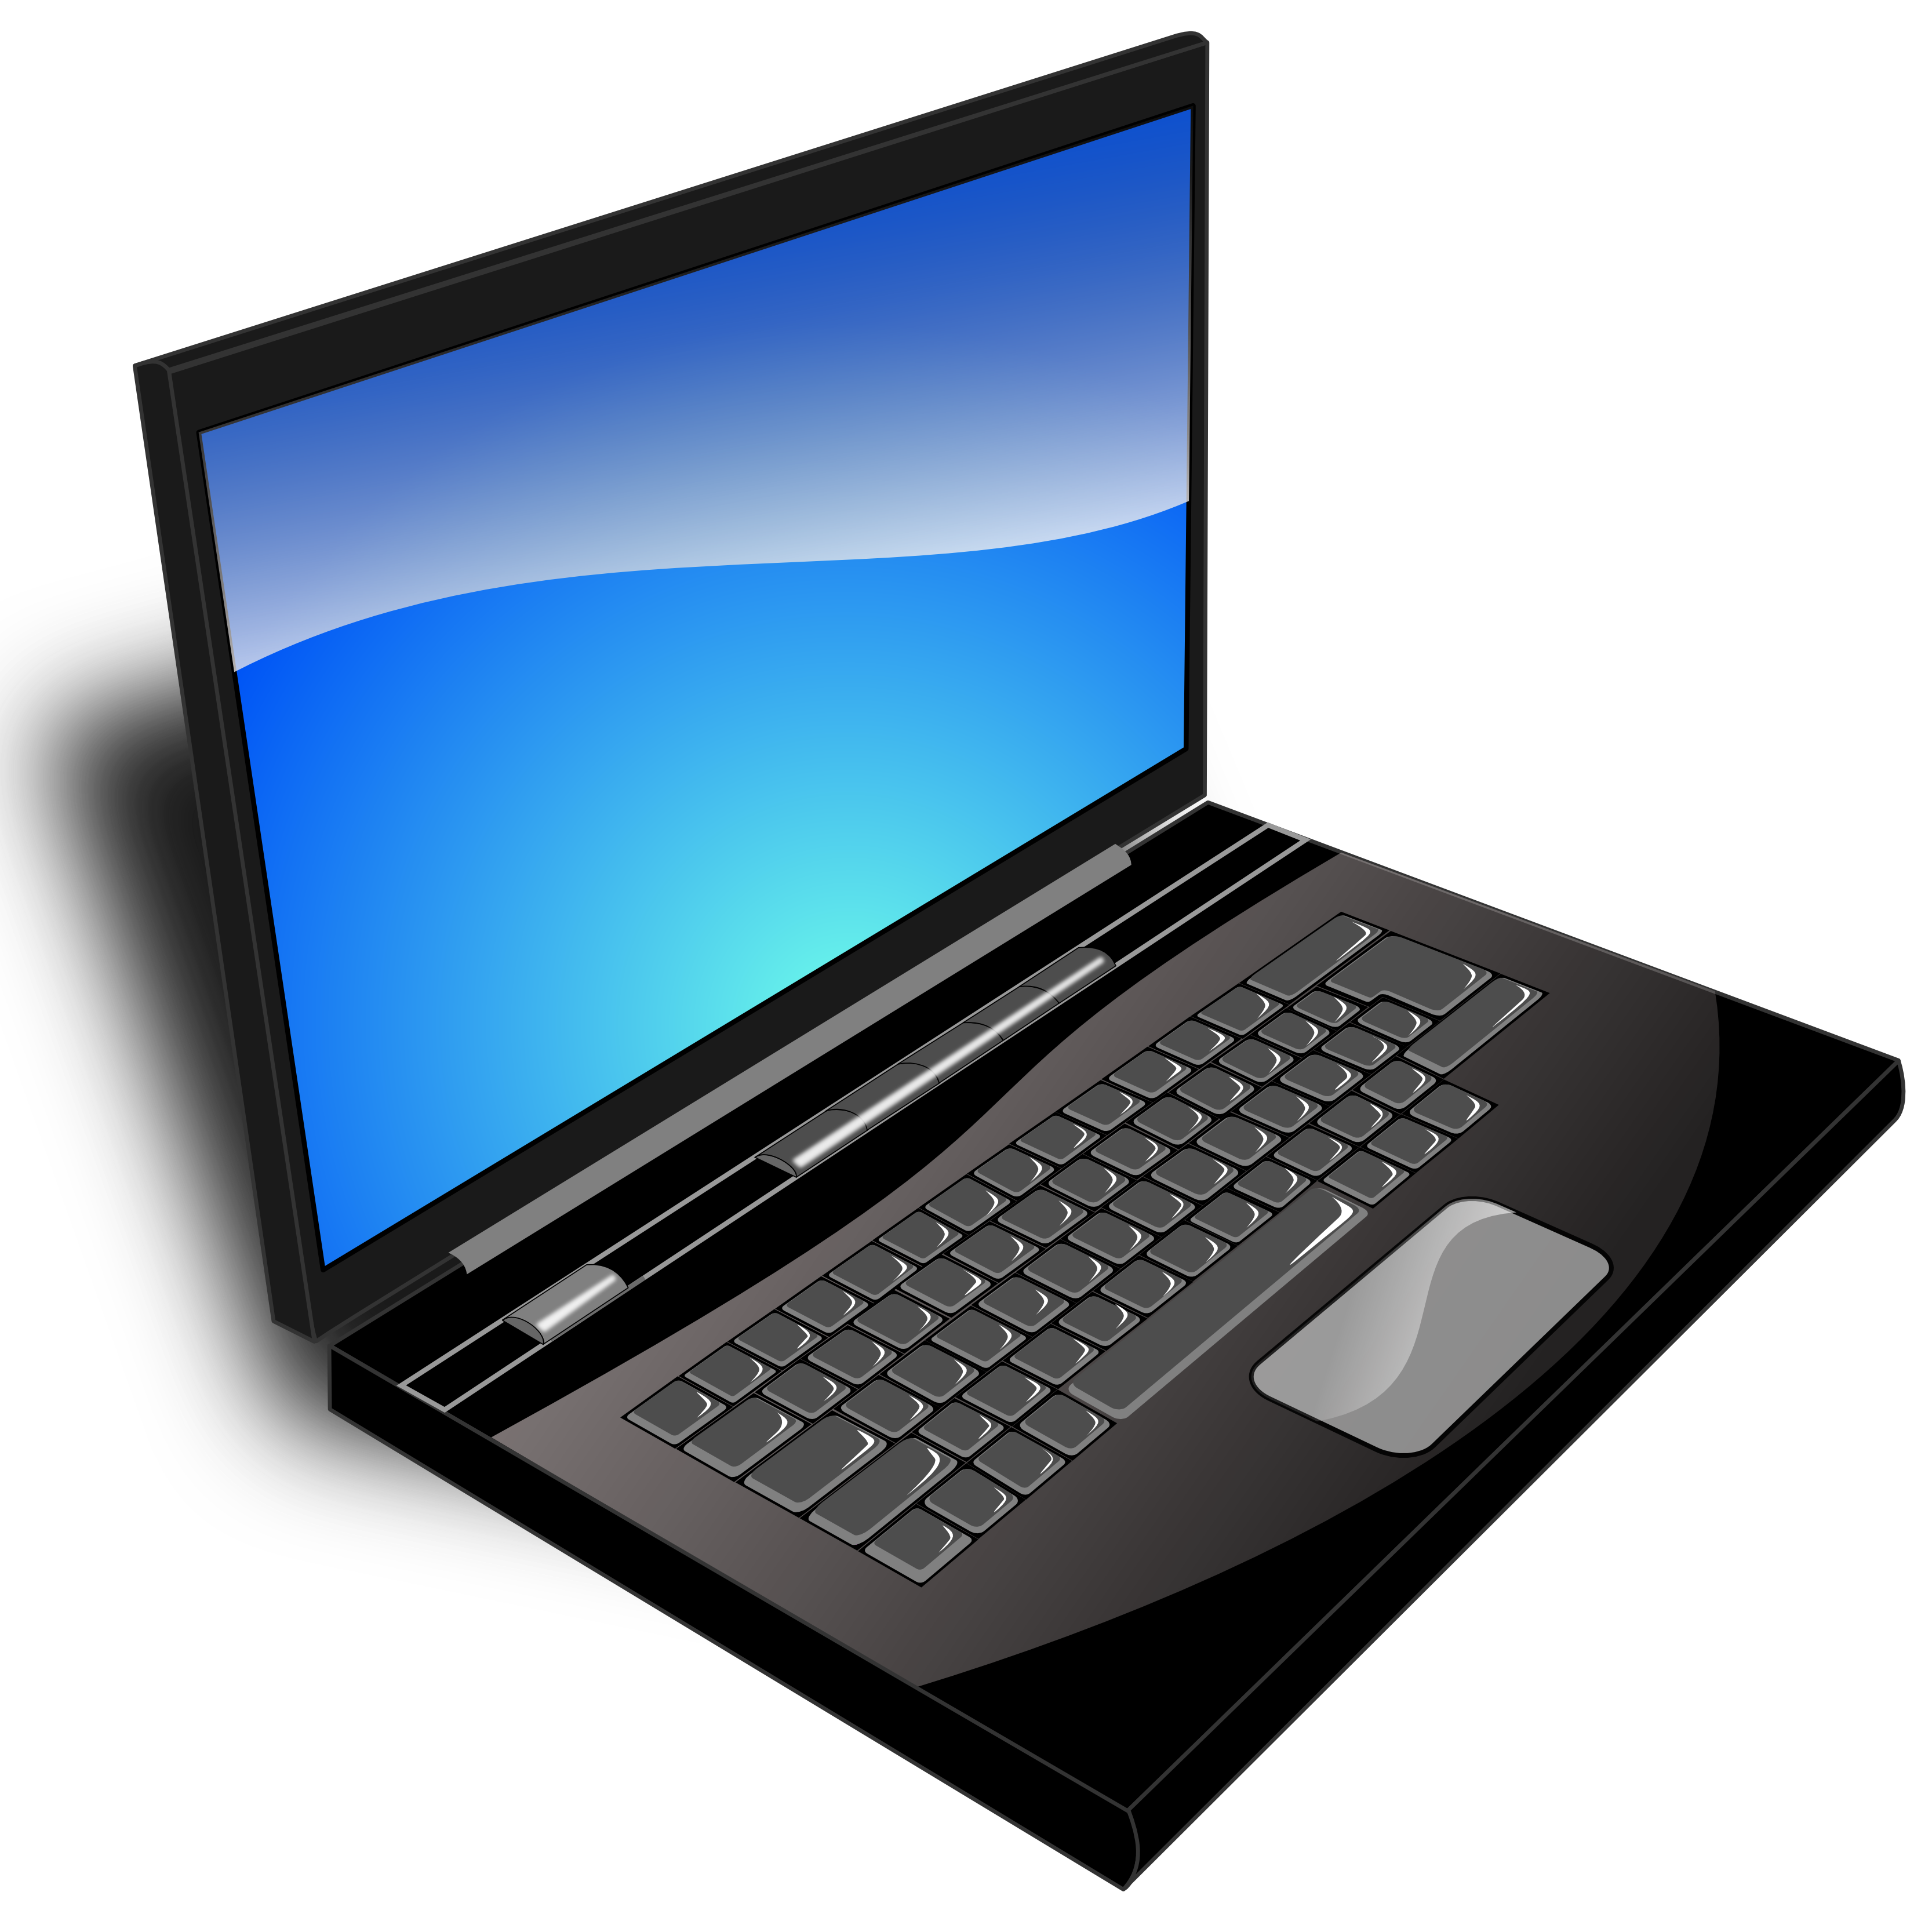 laptop png - Laptop PNG